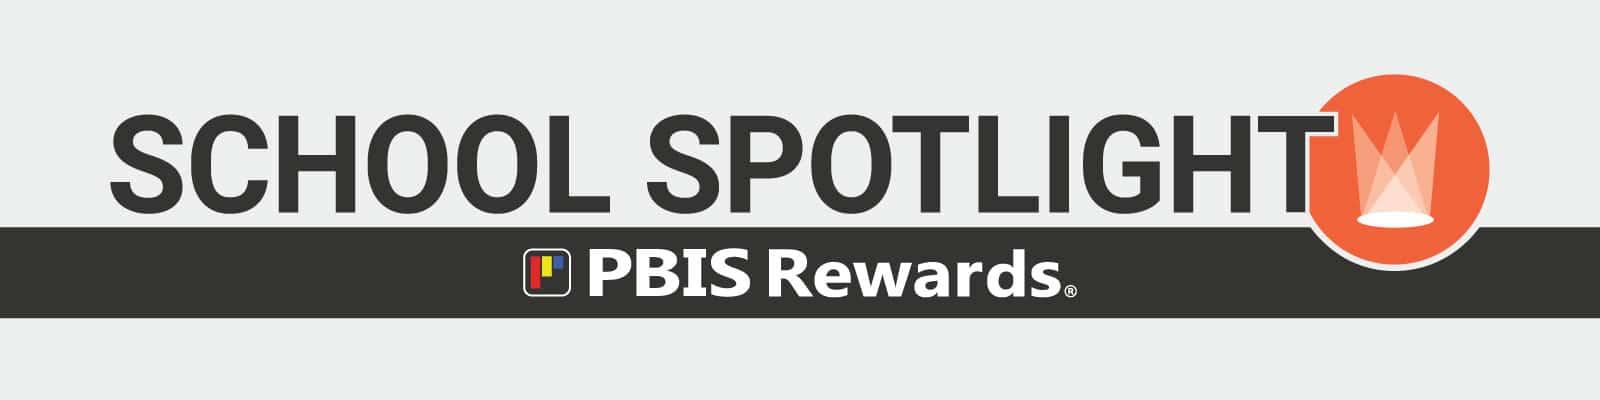 PBIS Rewards school spotlight